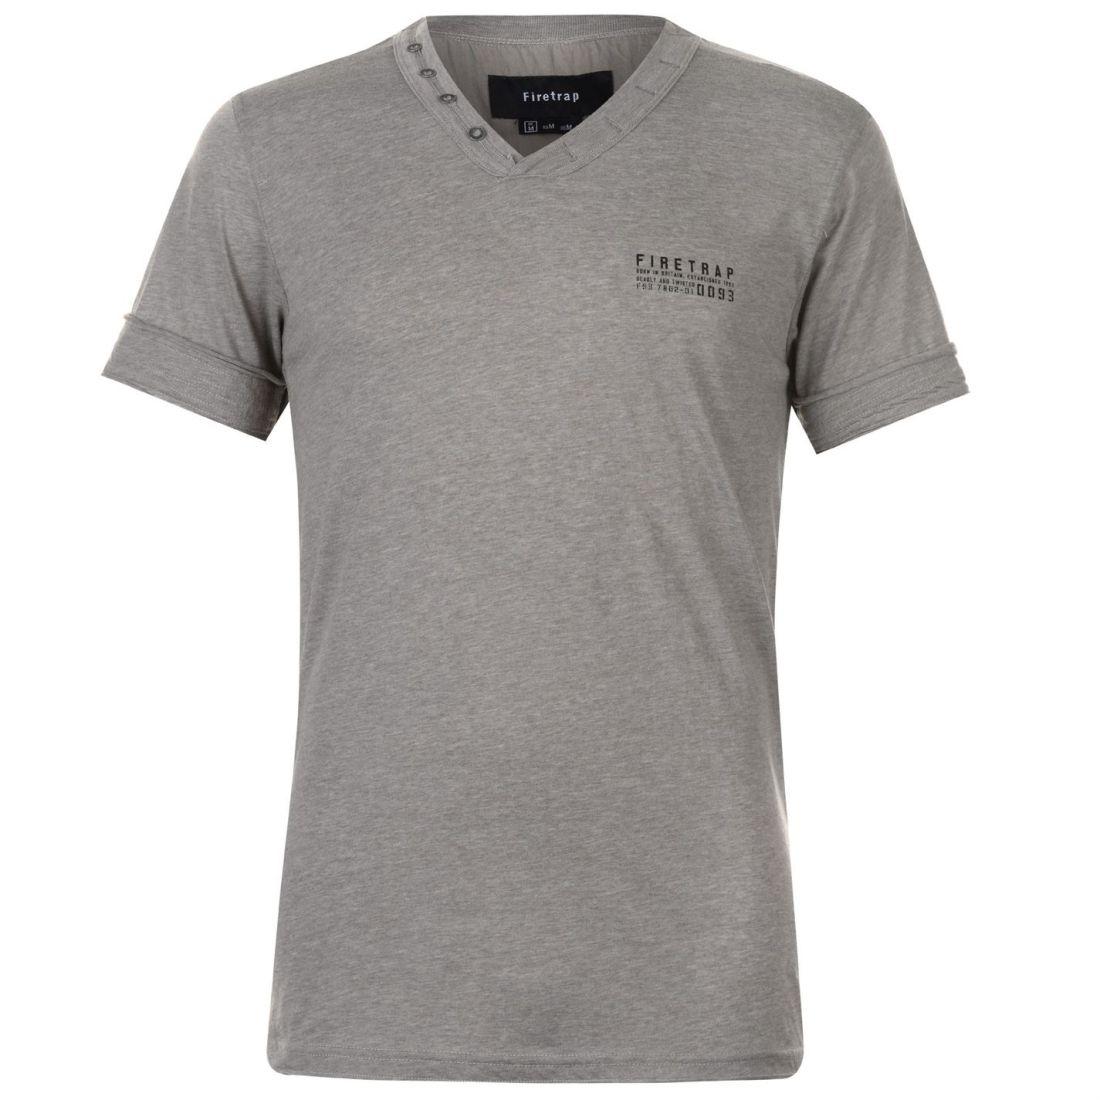 Firetrap Striding V Neck T Shirt Mens Gents